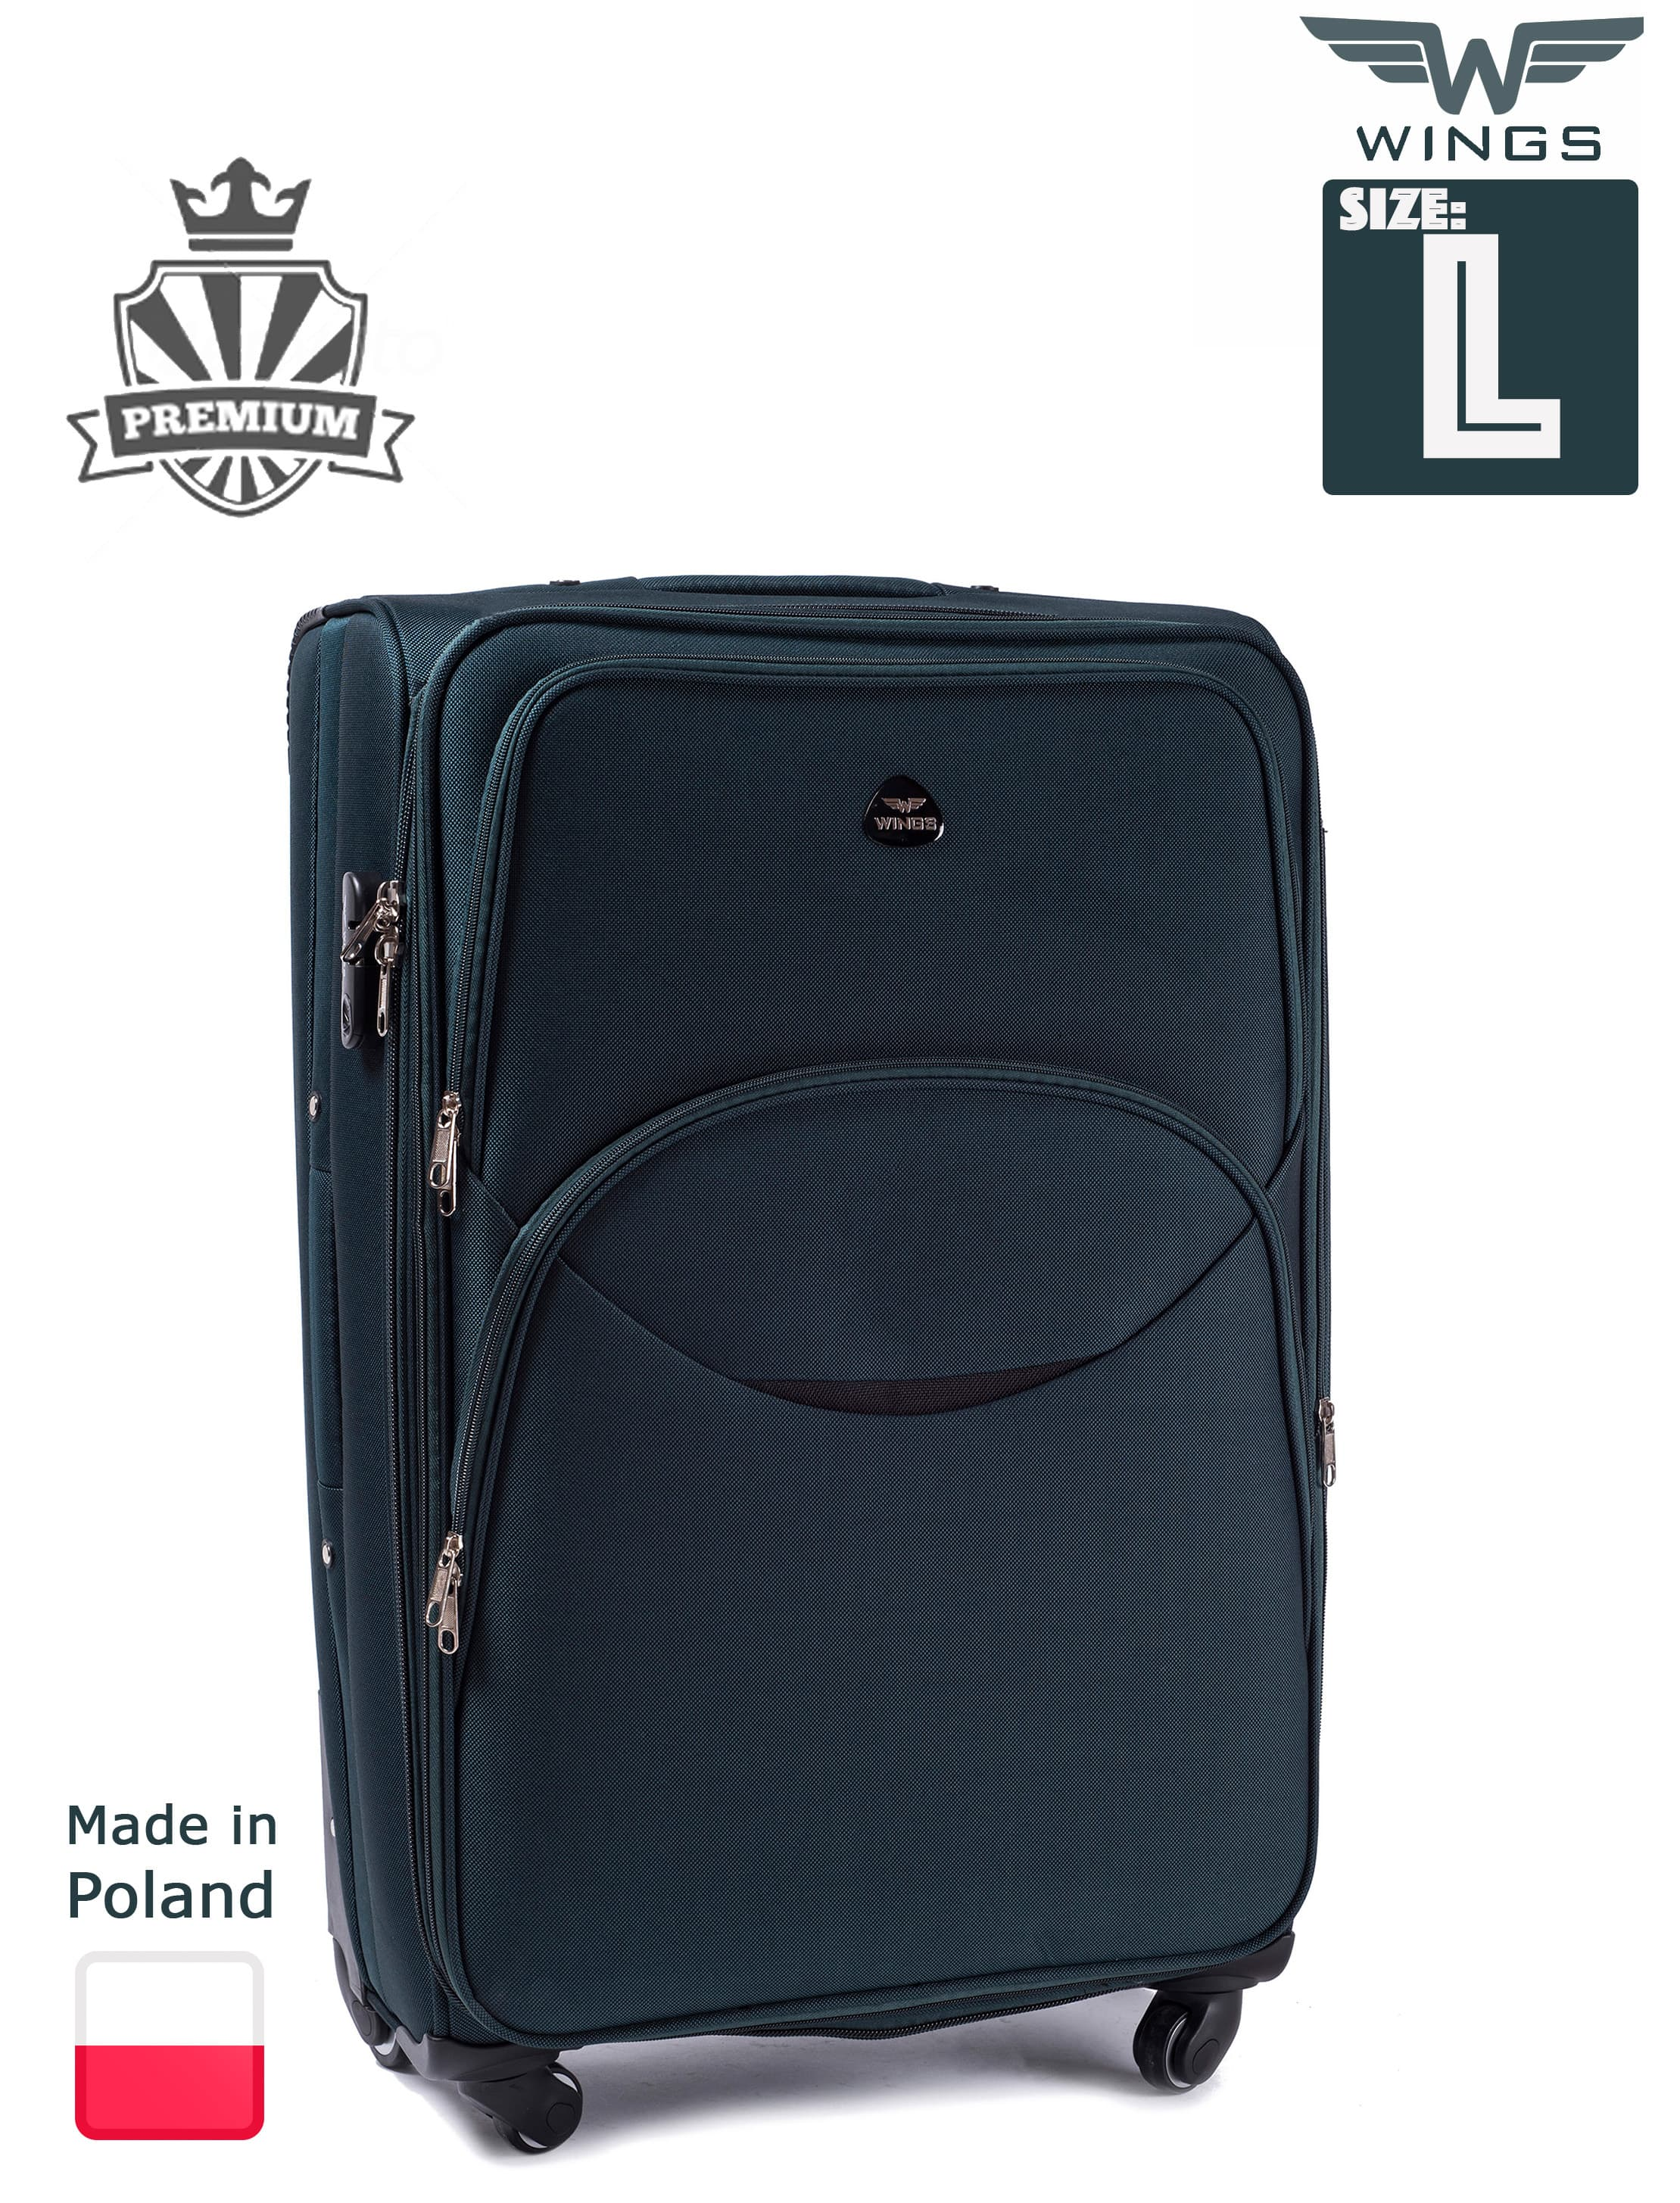 Большой Тканевый Чемодан Wings 1708-4 L Green PREMIUM на 4-х прочных колесах! Для багажа,до 23 кг